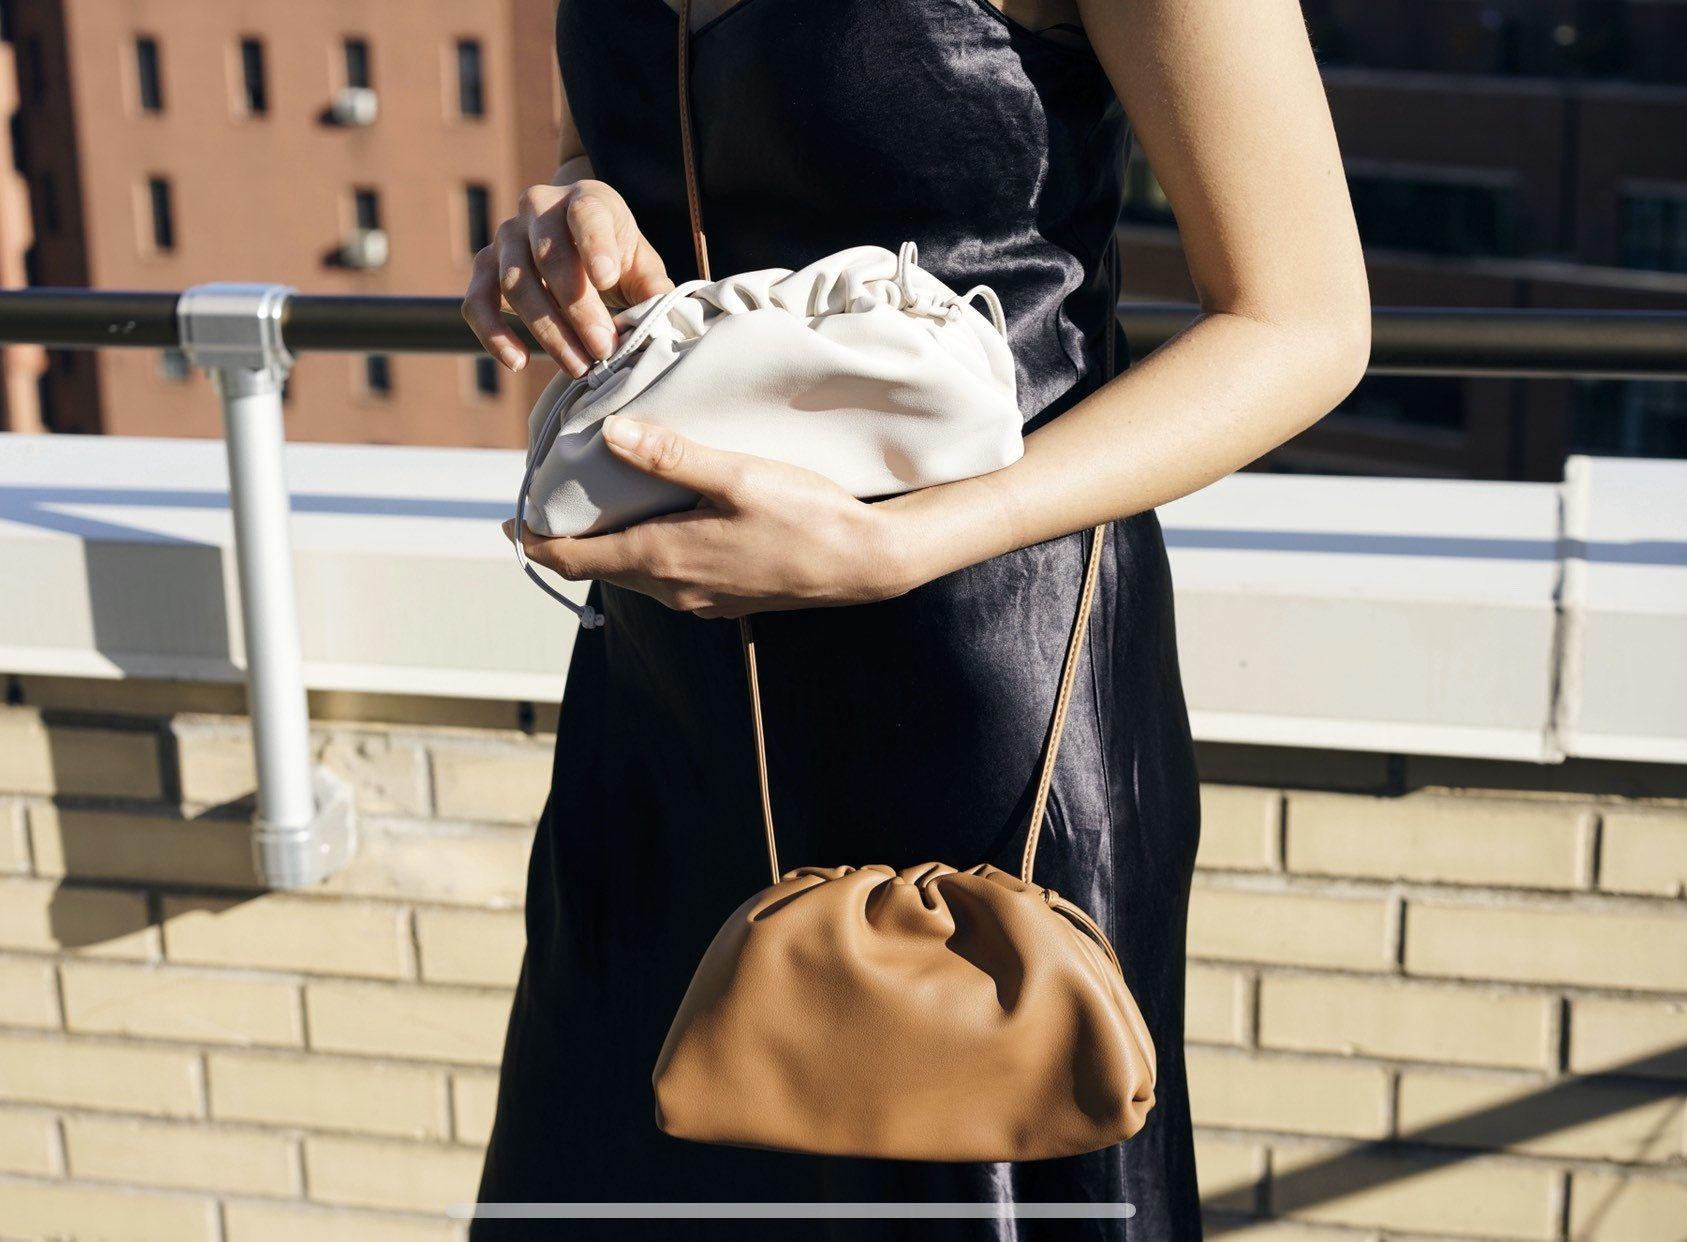 Mini Handmade crossbody The Pouch Leather Bag Soft Calf Clutch Bottega Style